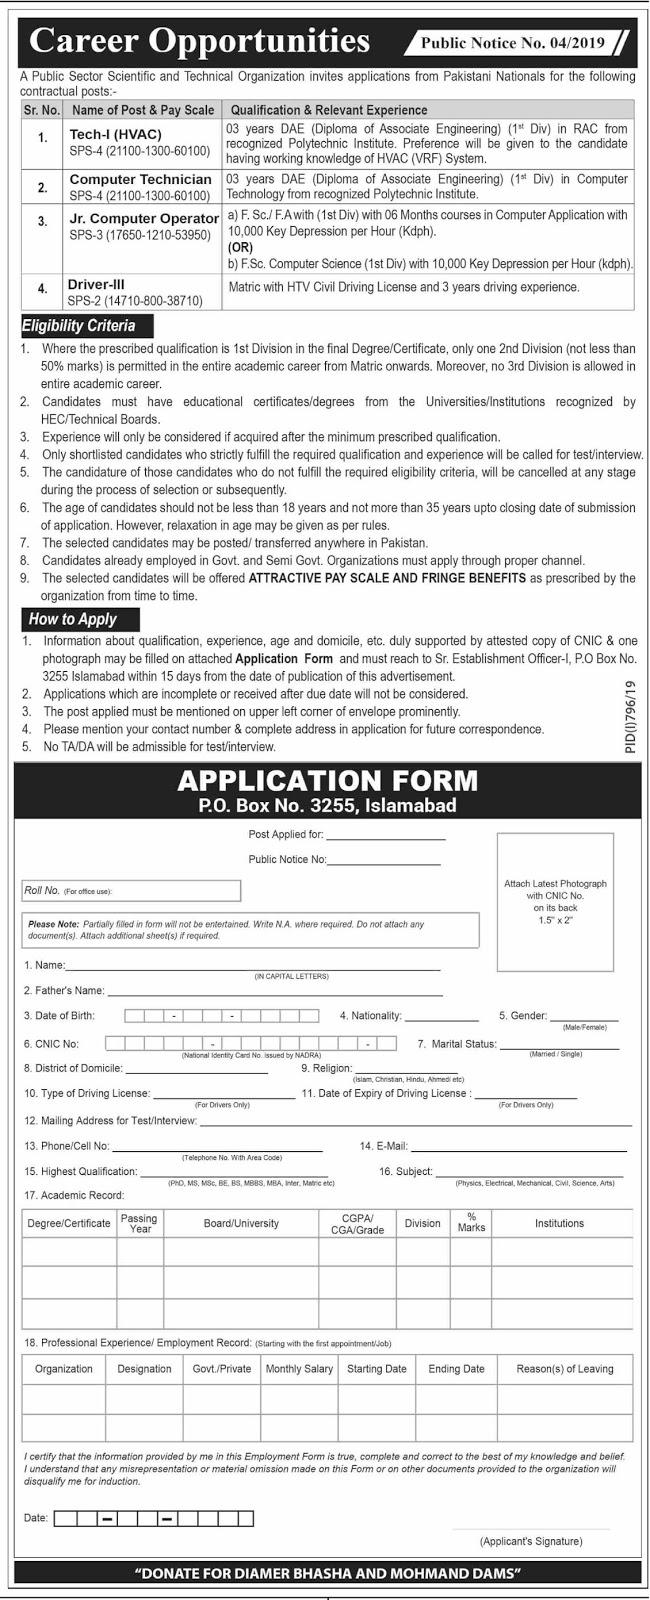 Advertisement for Public Sector Organization Jobs